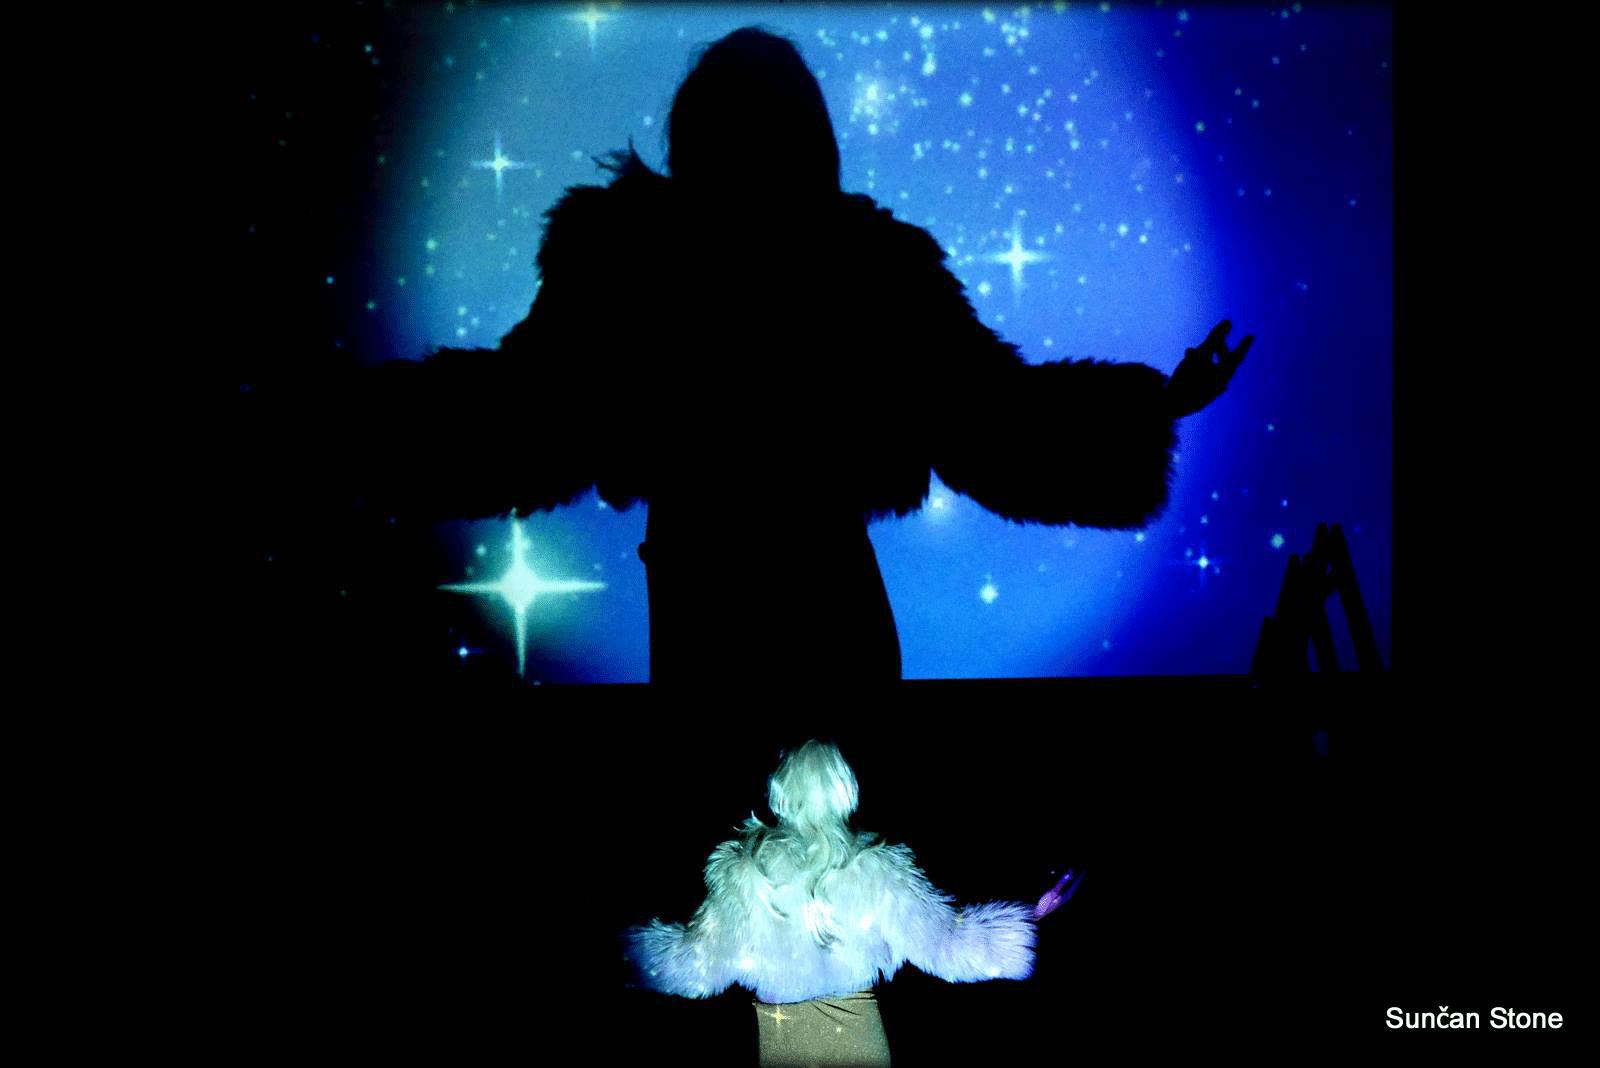 perf_nightlife_moderna_S_Aljaz-princess-wth-stars-screen-back-large_2015.png